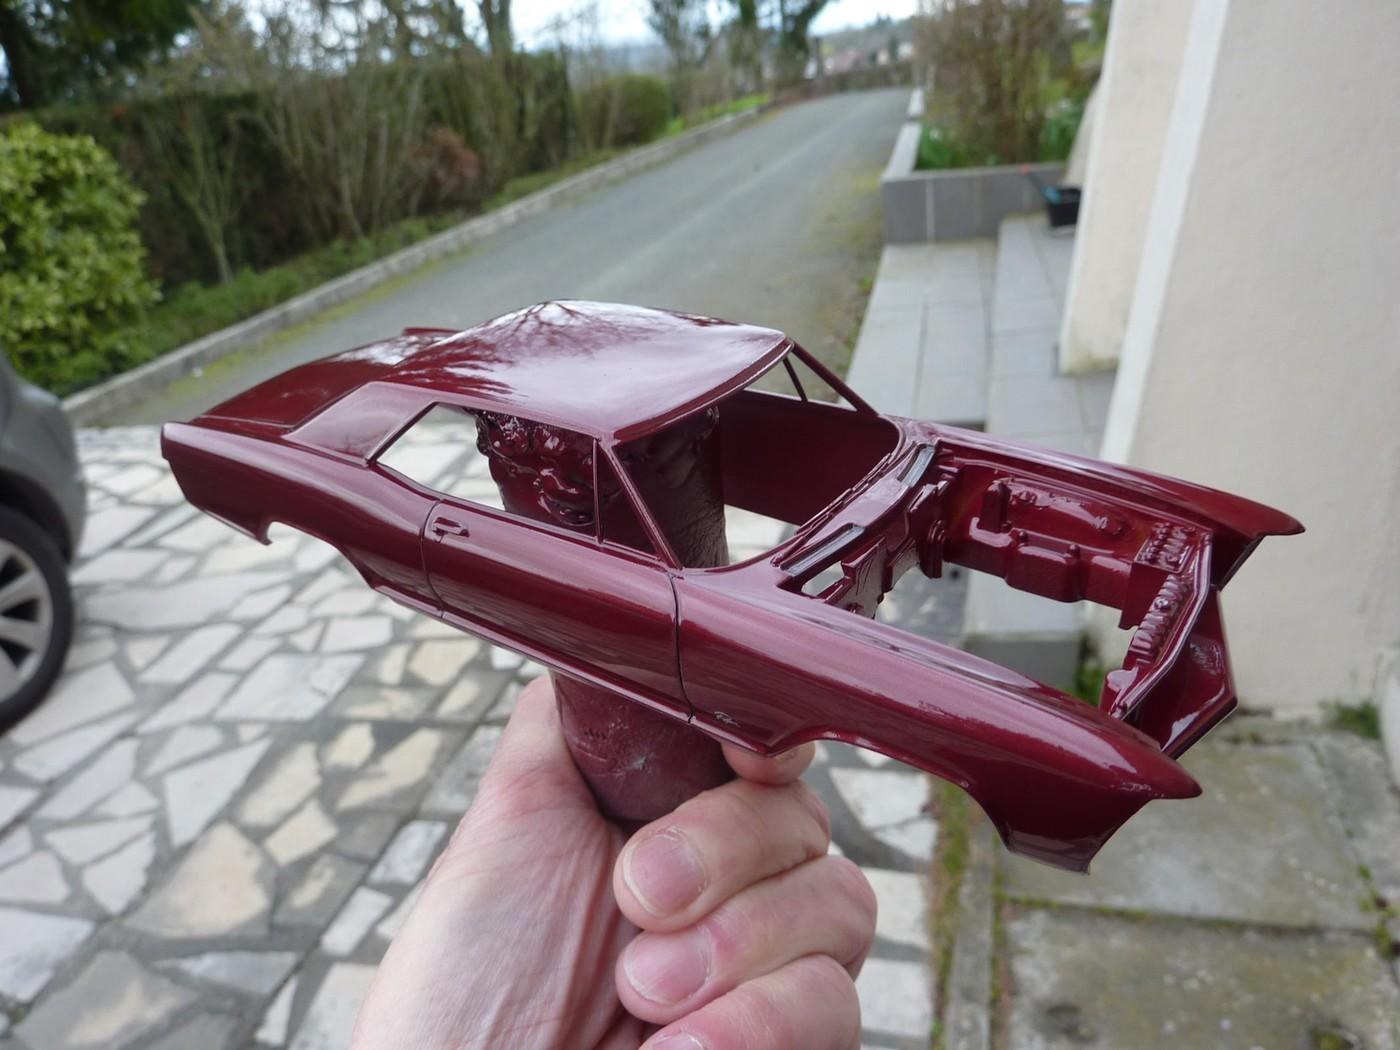 Buick Riviera 65 terminée - Page 2 Photo2-vi